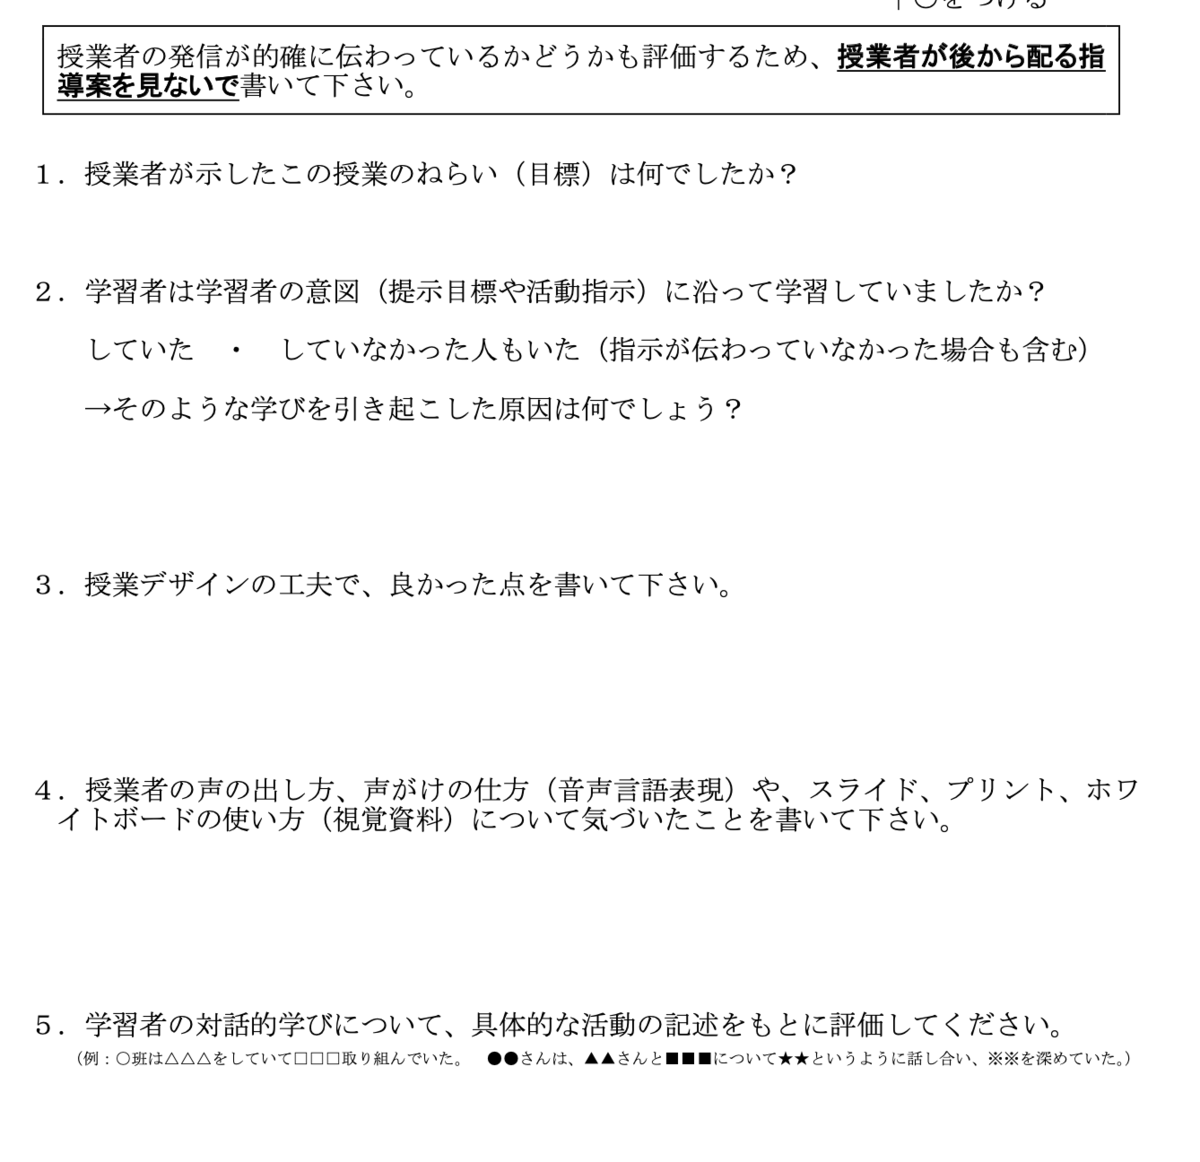 f:id:F-Katagiri:20201110180312p:plain:w260:left